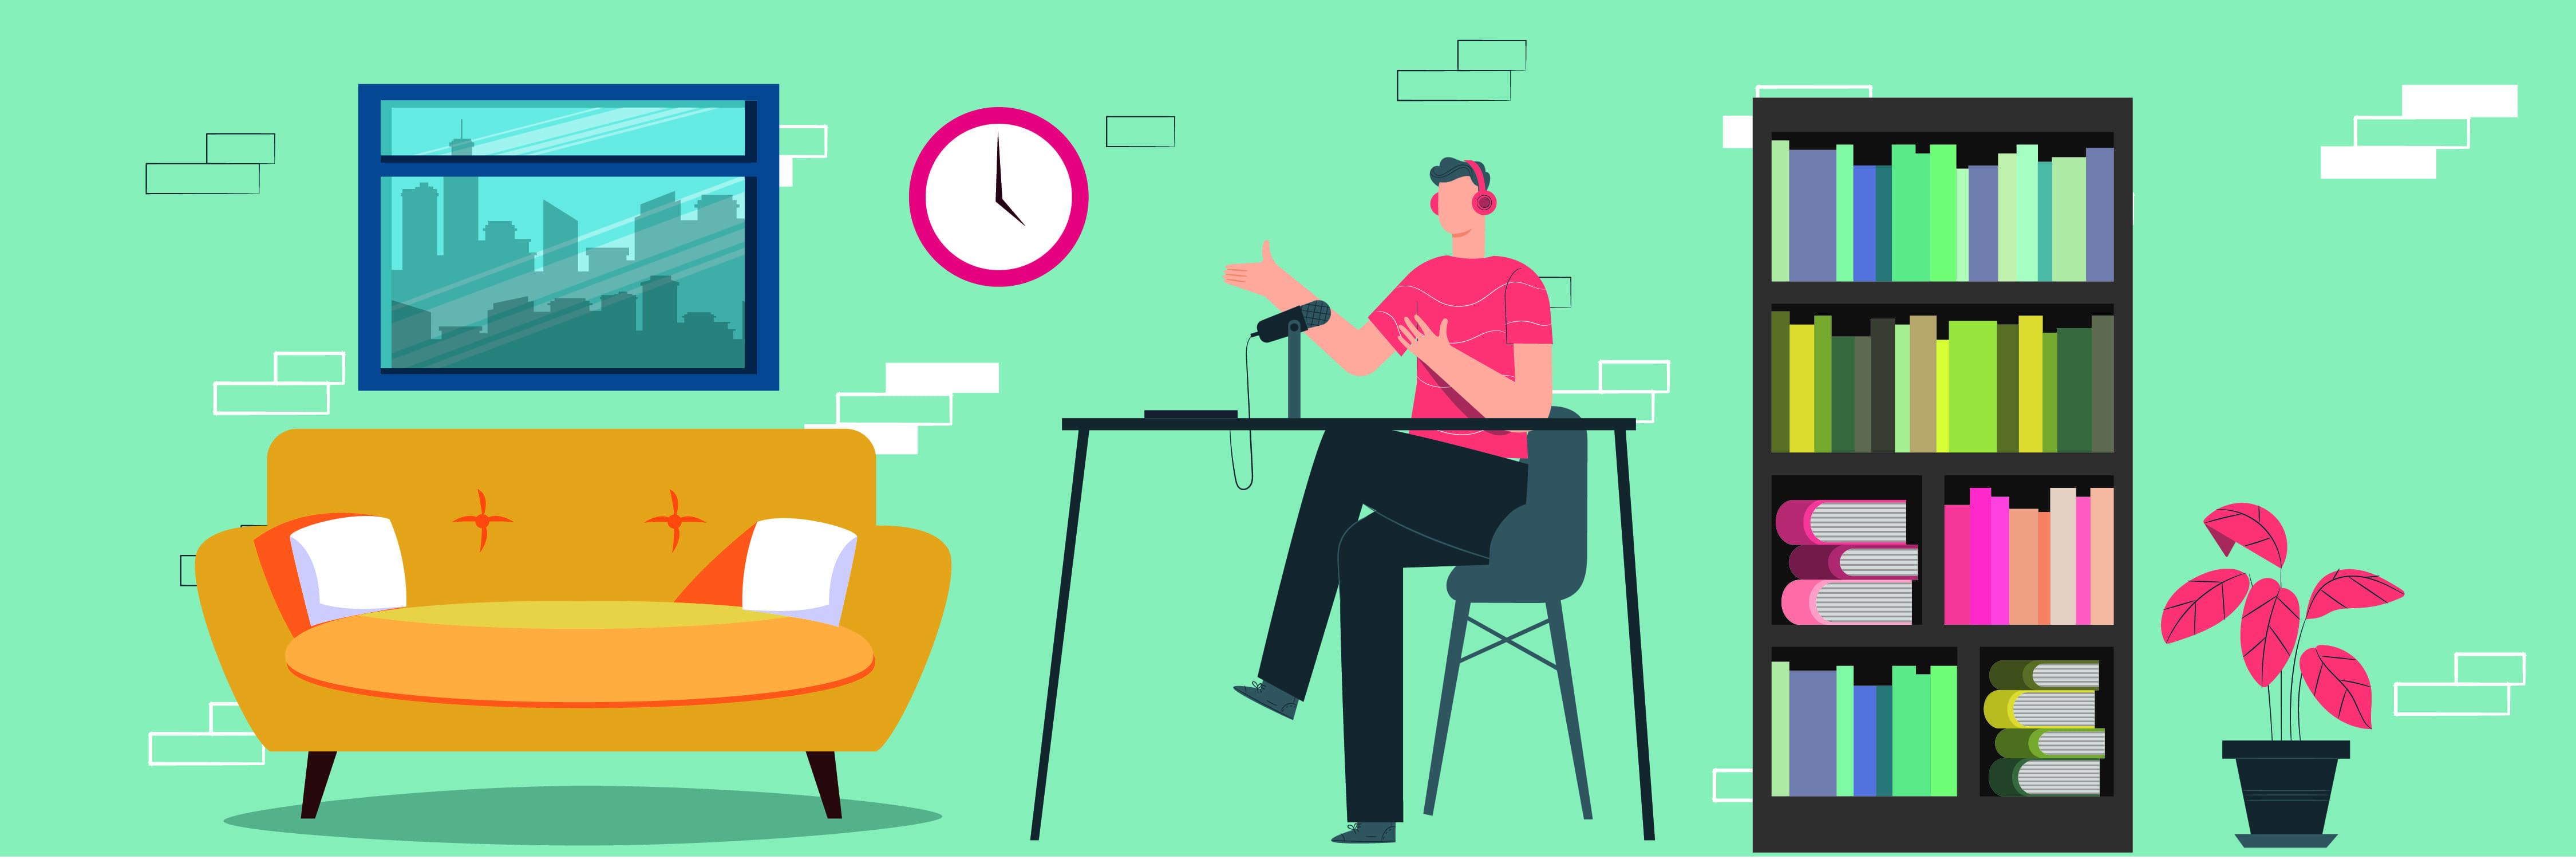 freelance podcast and freelance podcasting